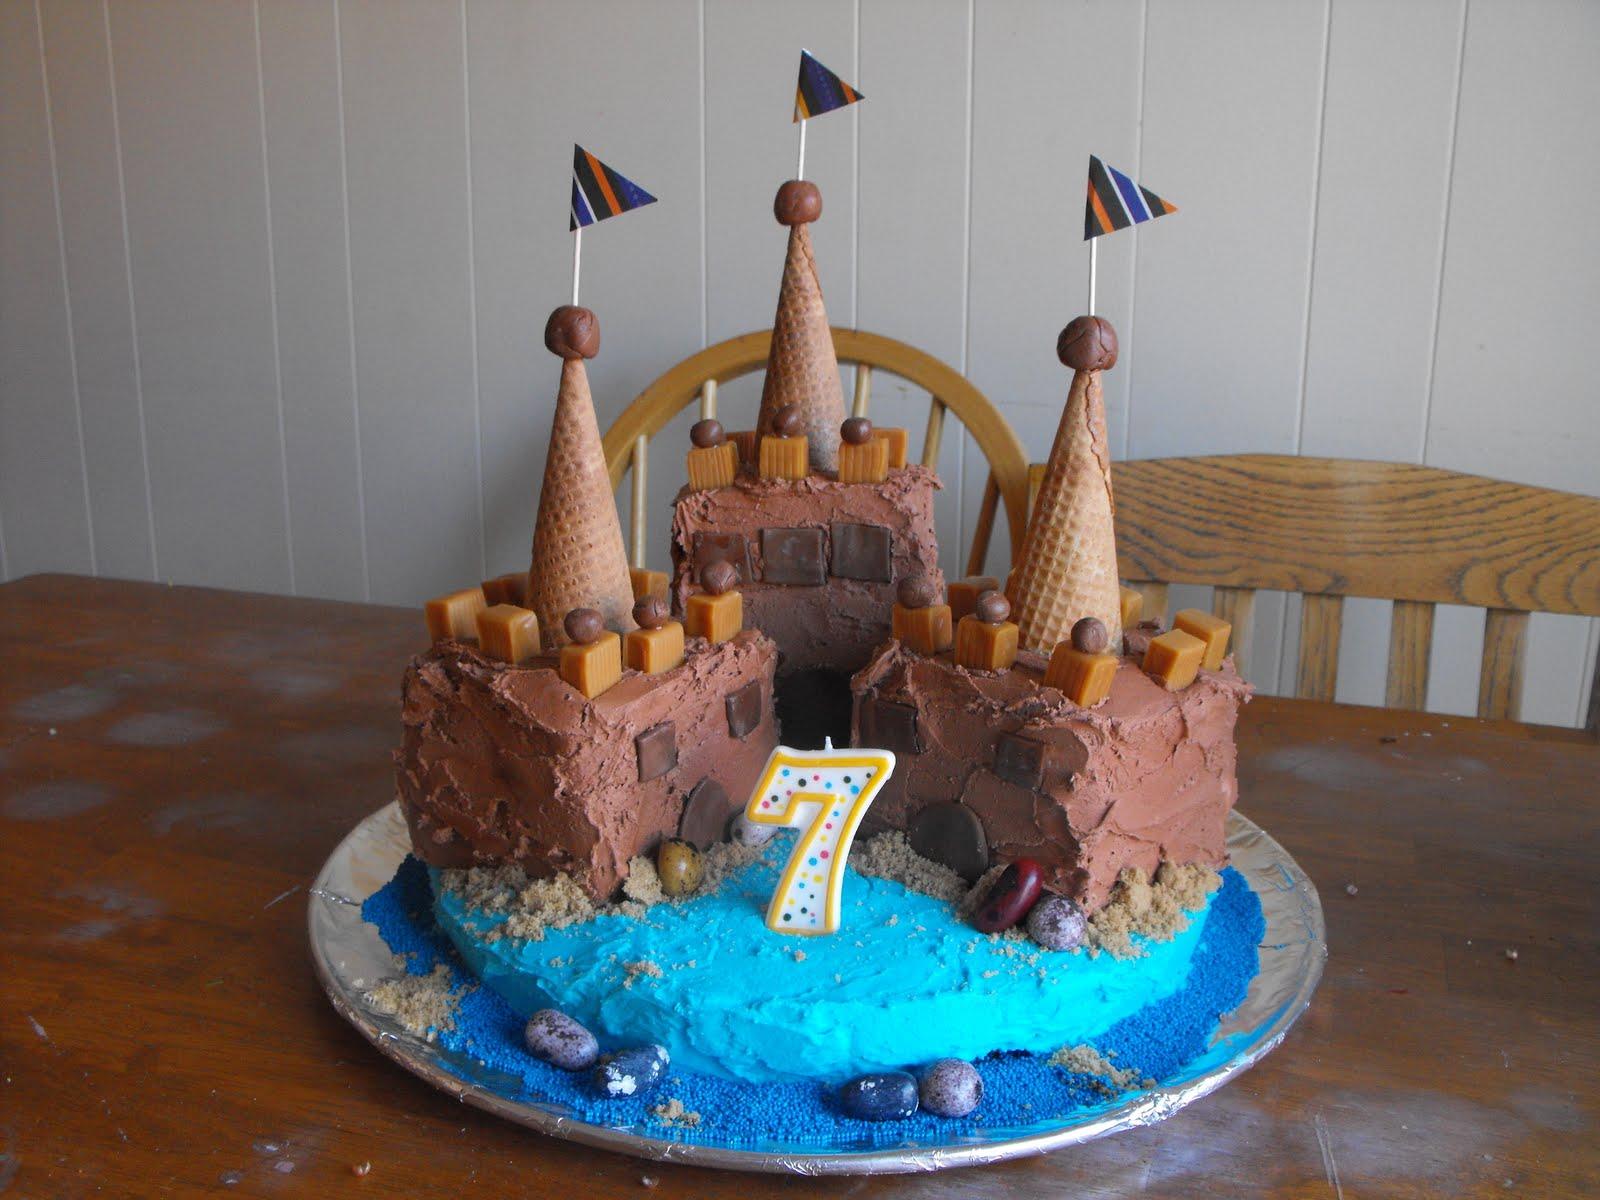 One Orange Giraffe Sand Castle Birthday Cake